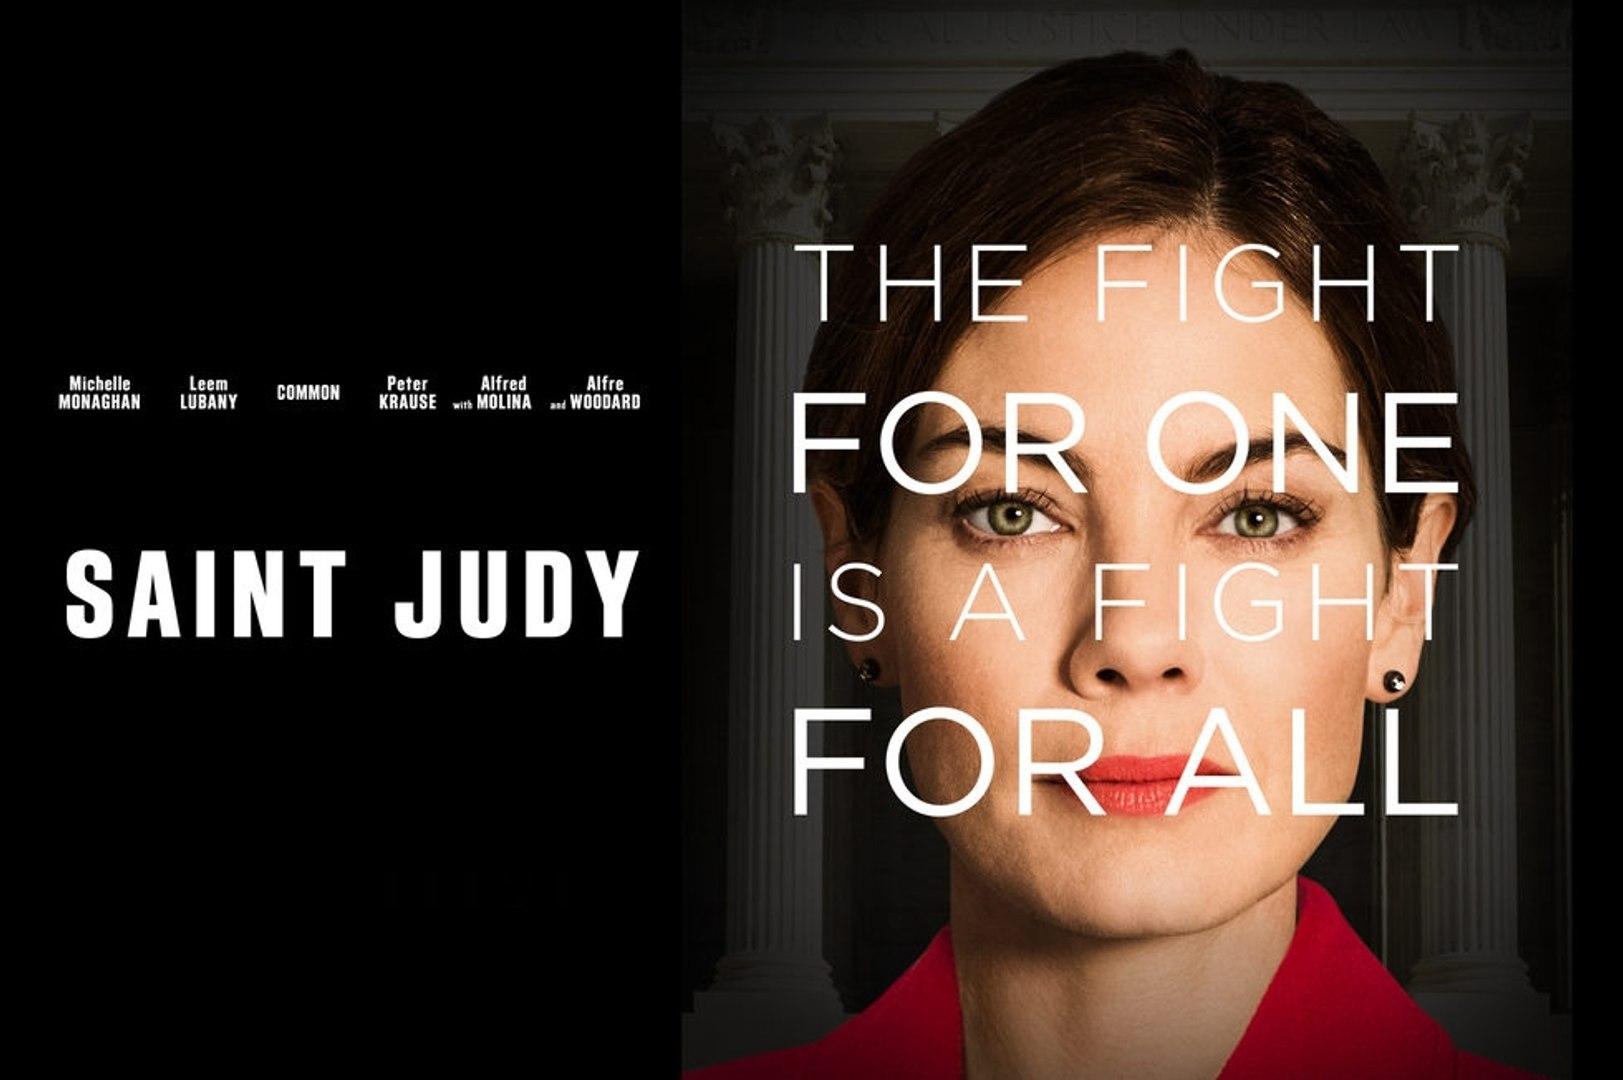 Saint Judy Movie (2019) - Michelle Monaghan, Leem Lubany, Common, Alfred  Molina,